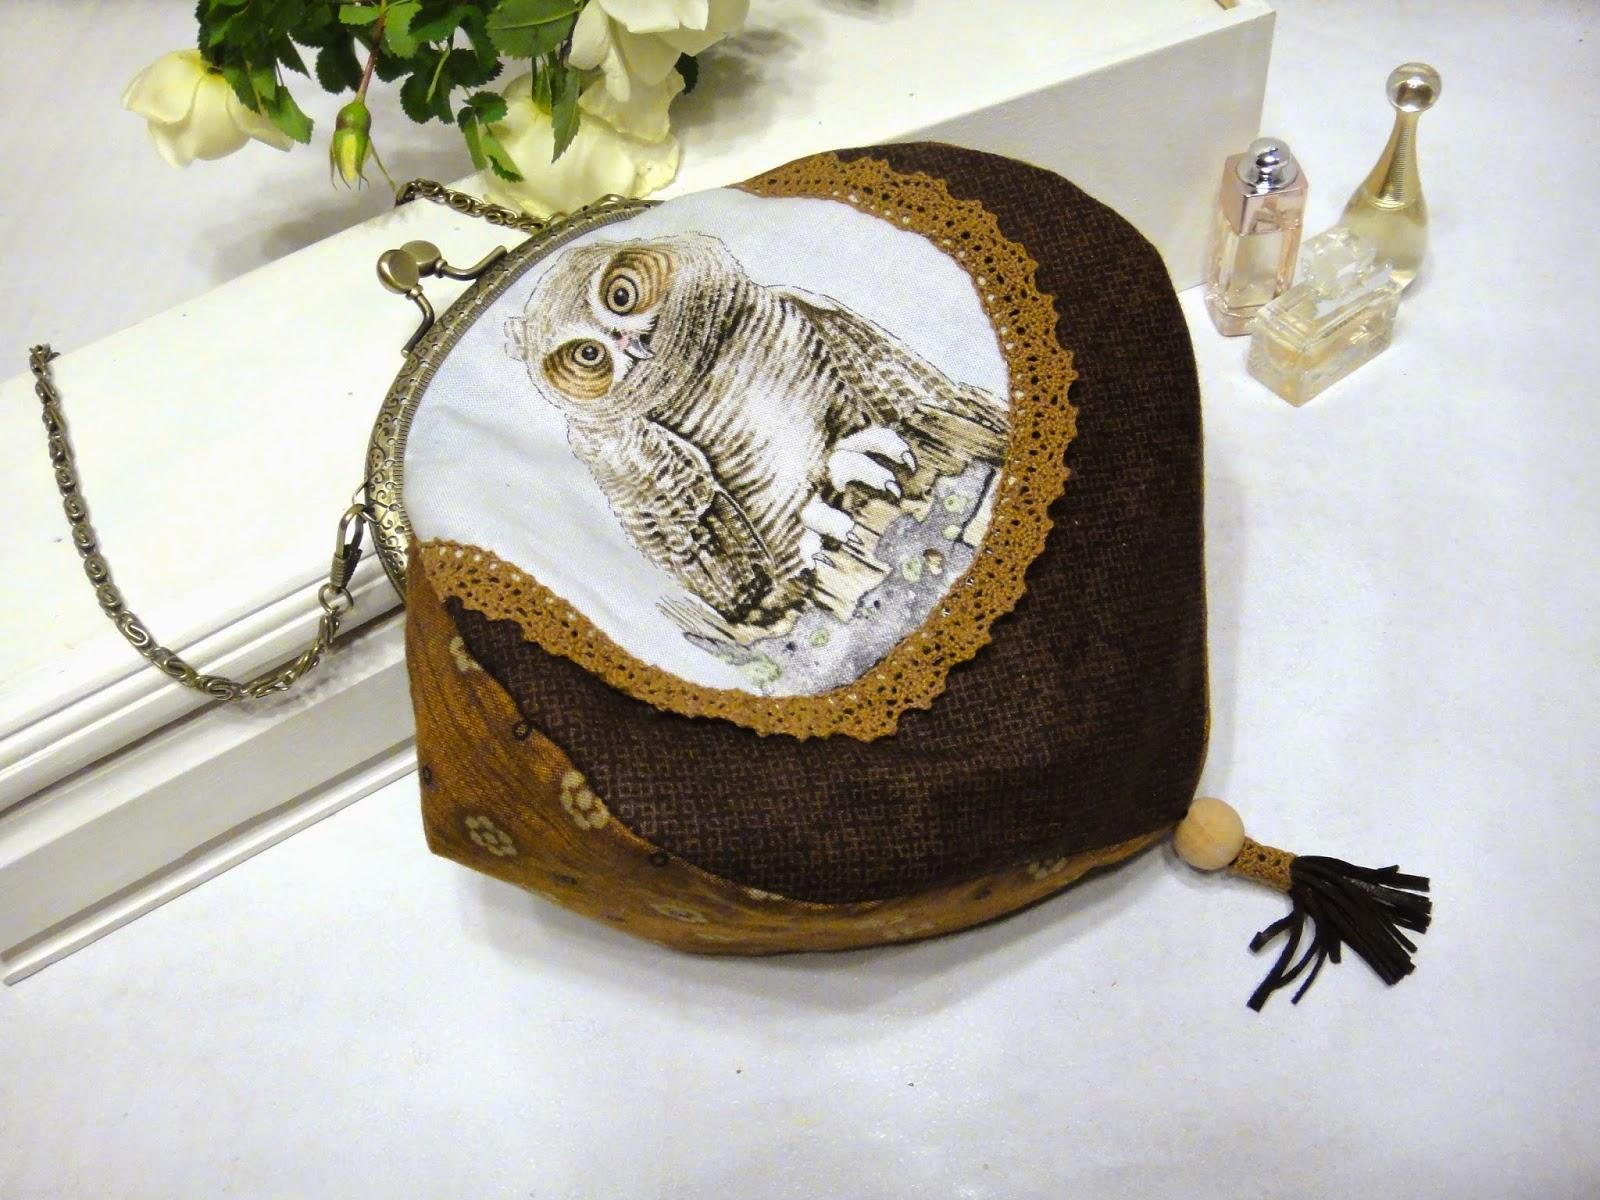 вечерняя сумочка на цепочке для девушки